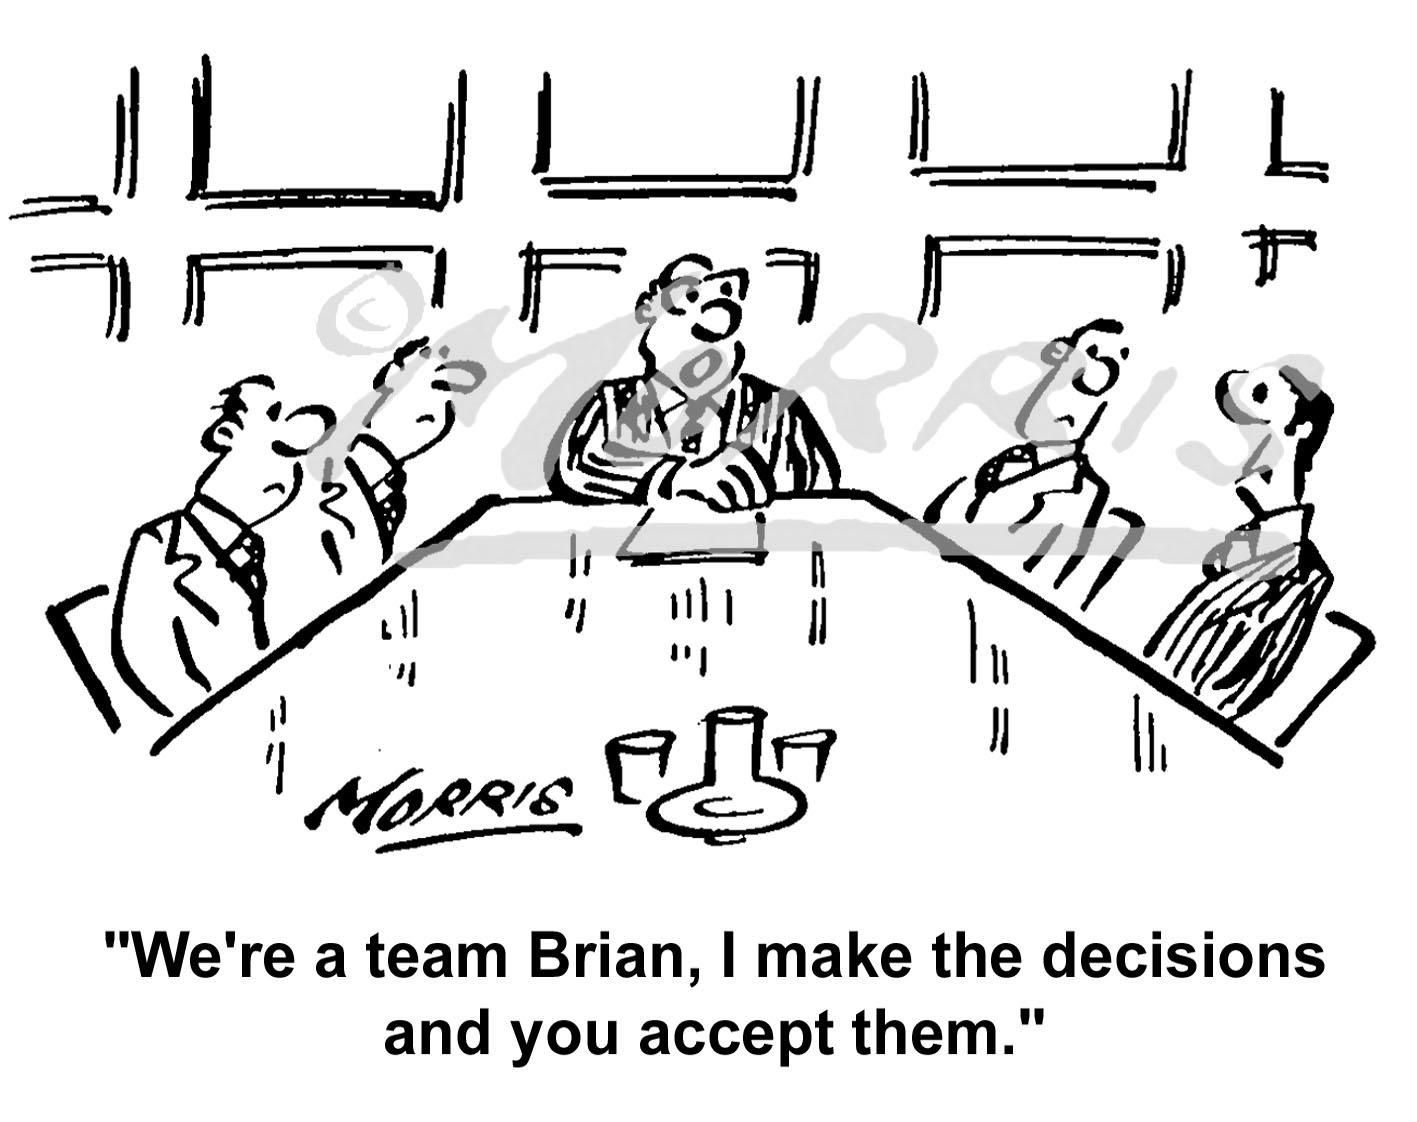 Boardroom cartoon Ref: 1768bw